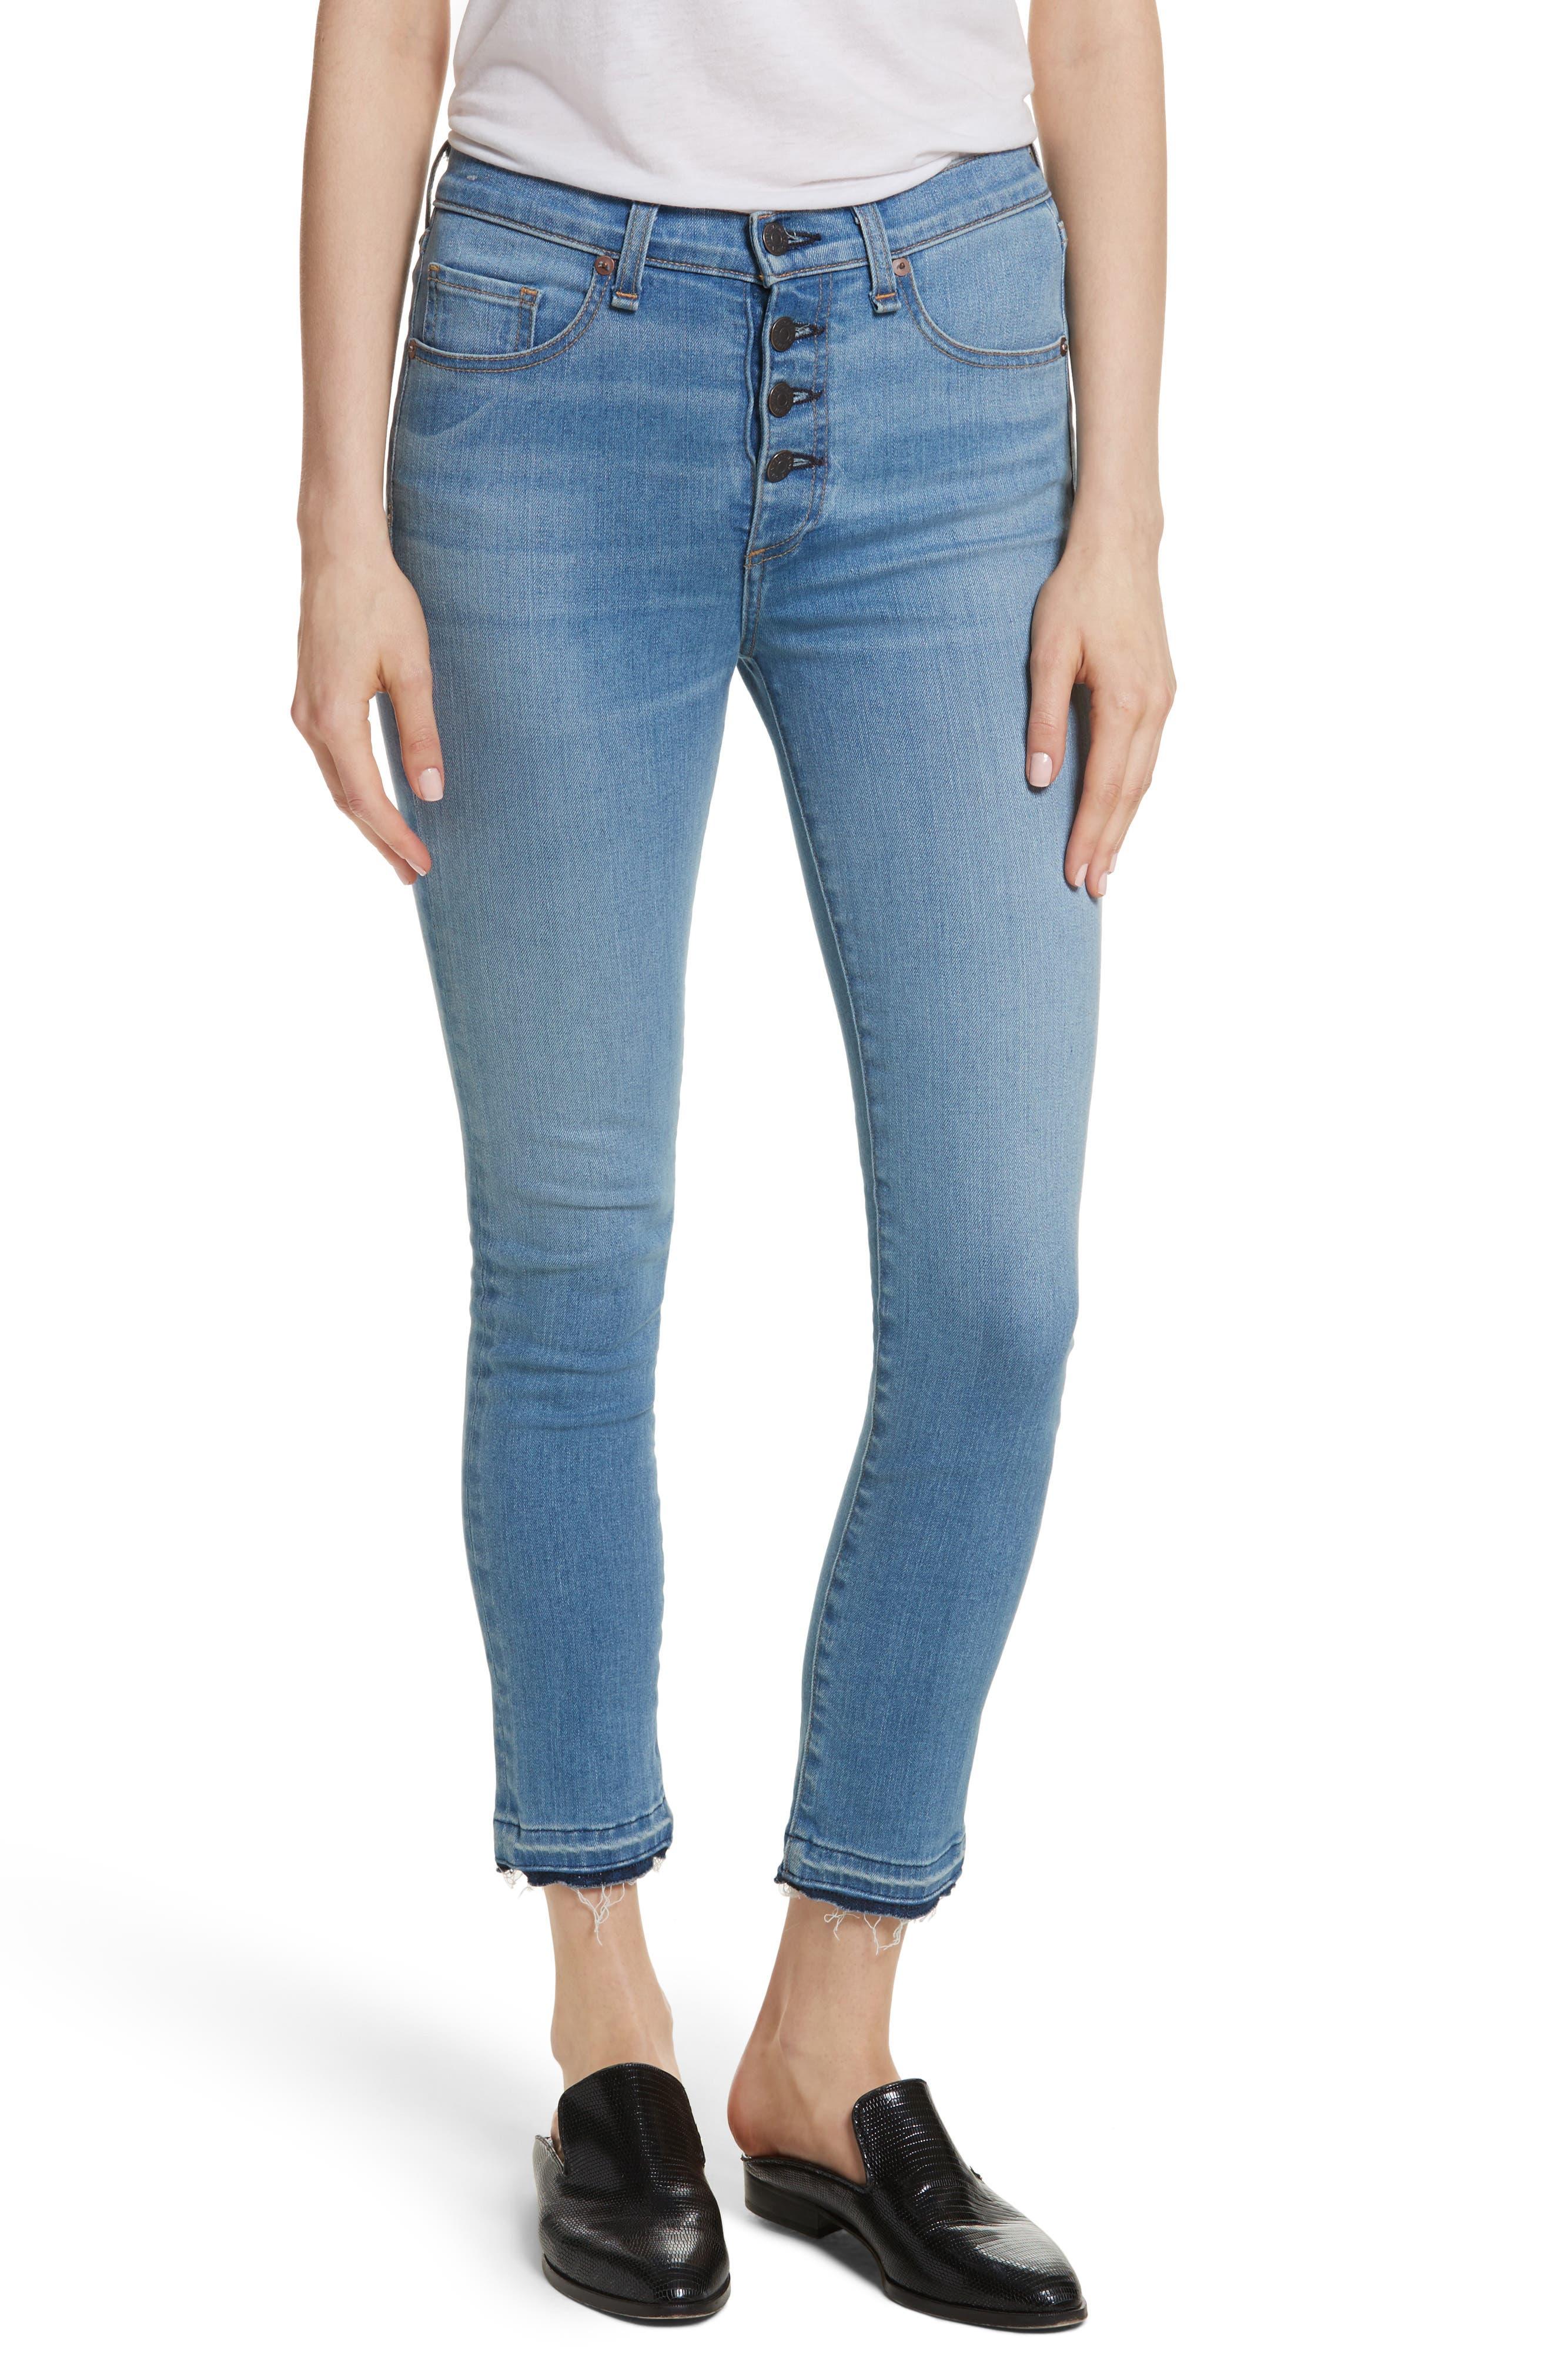 Debbie High Waist Fray Hem Jeans,                             Main thumbnail 1, color,                             Retro Blue